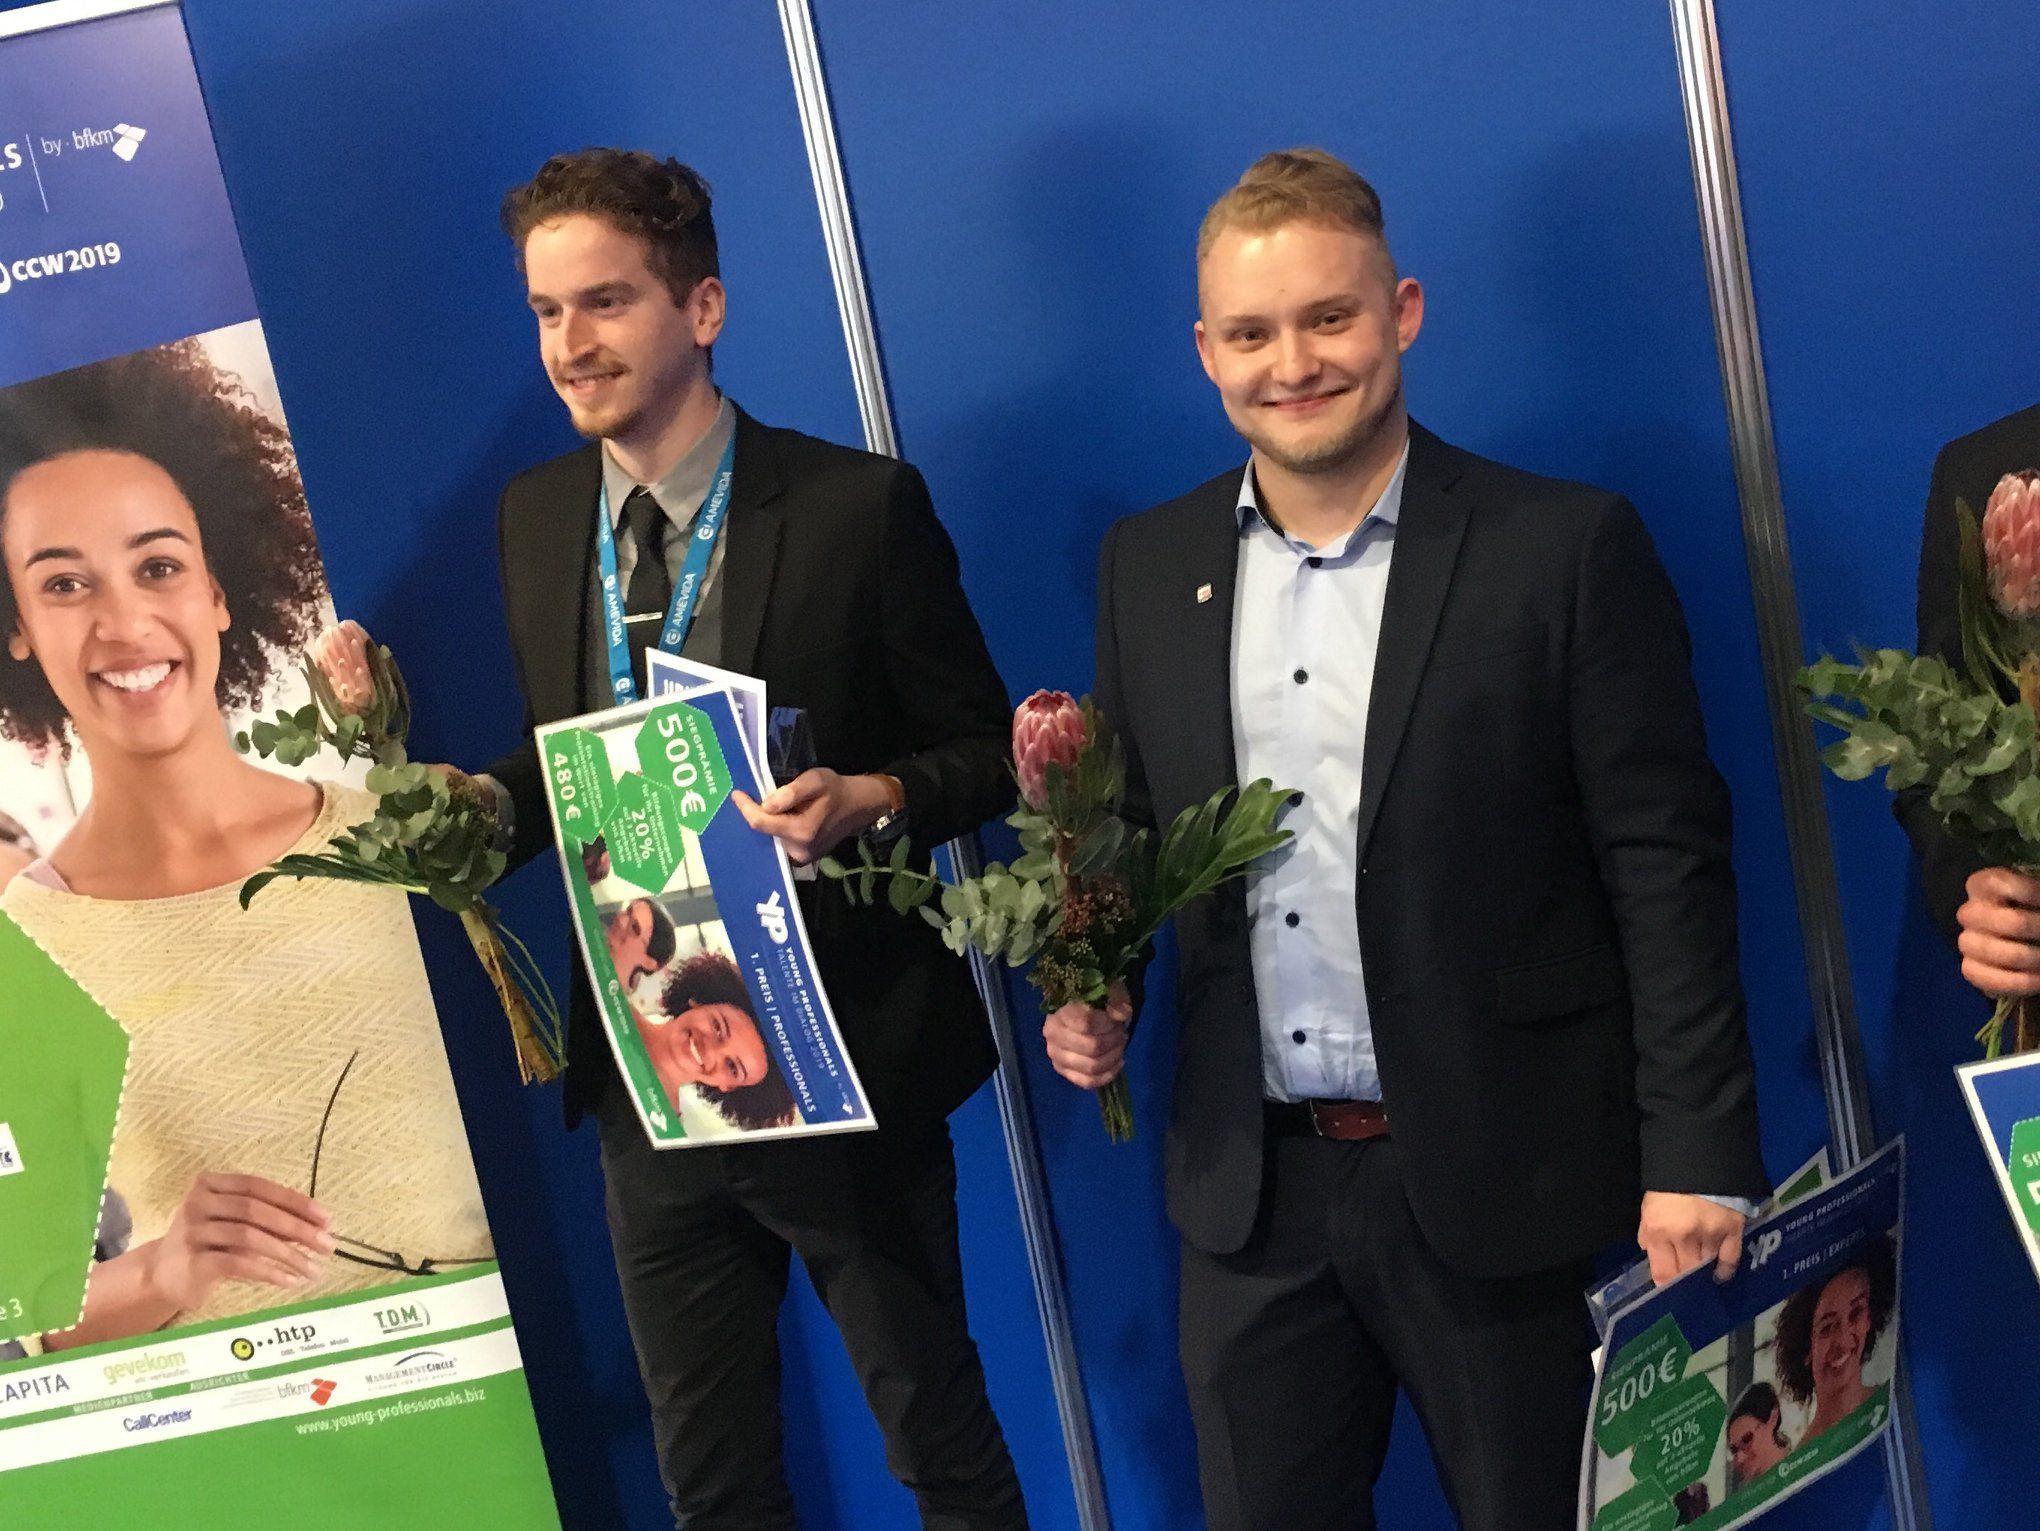 Young Professionals 2019 1 Platz Ccw Berlin Gewinner